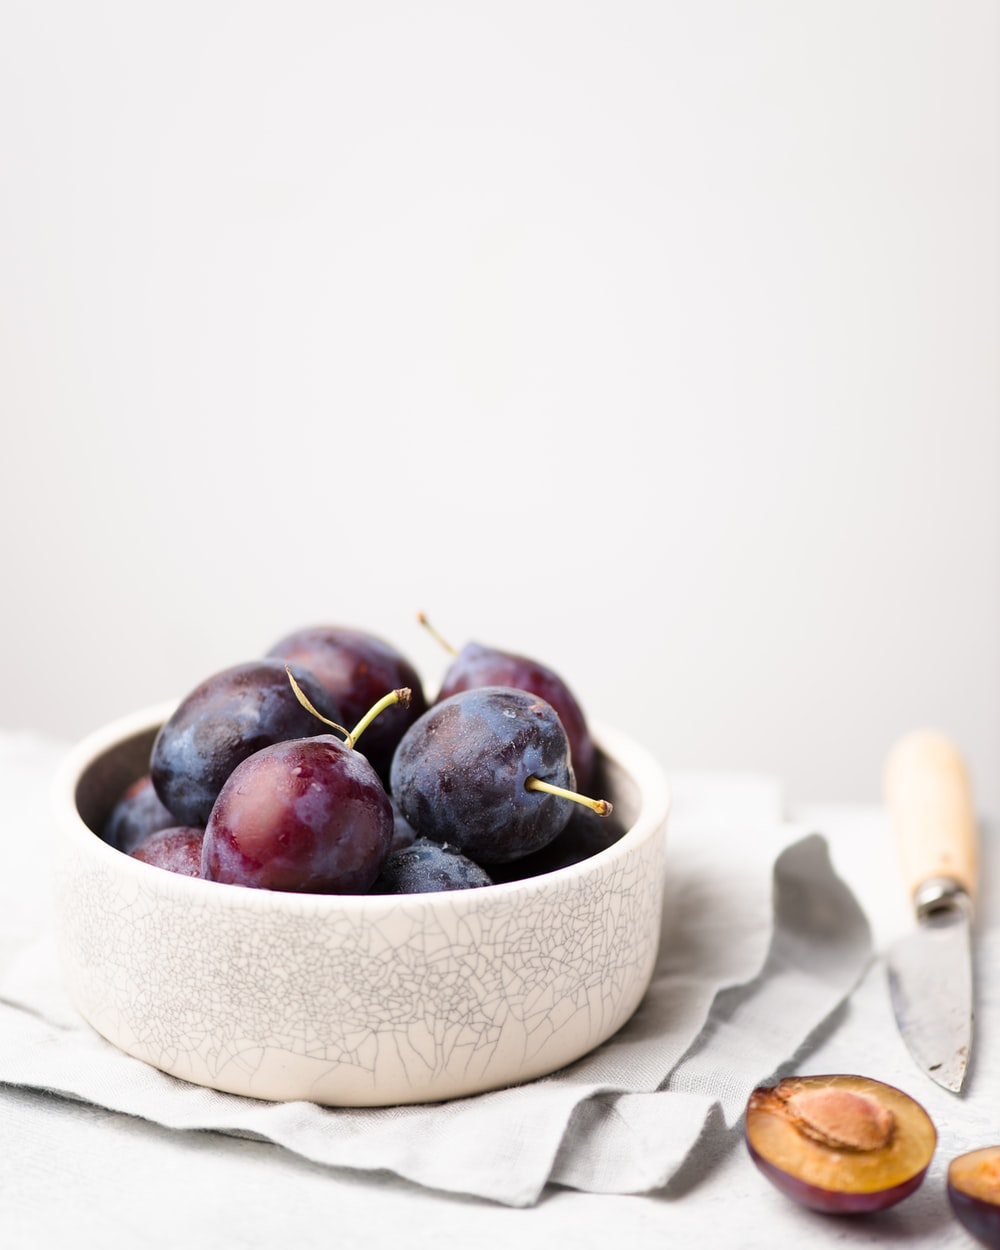 purple grapes on round white bowl